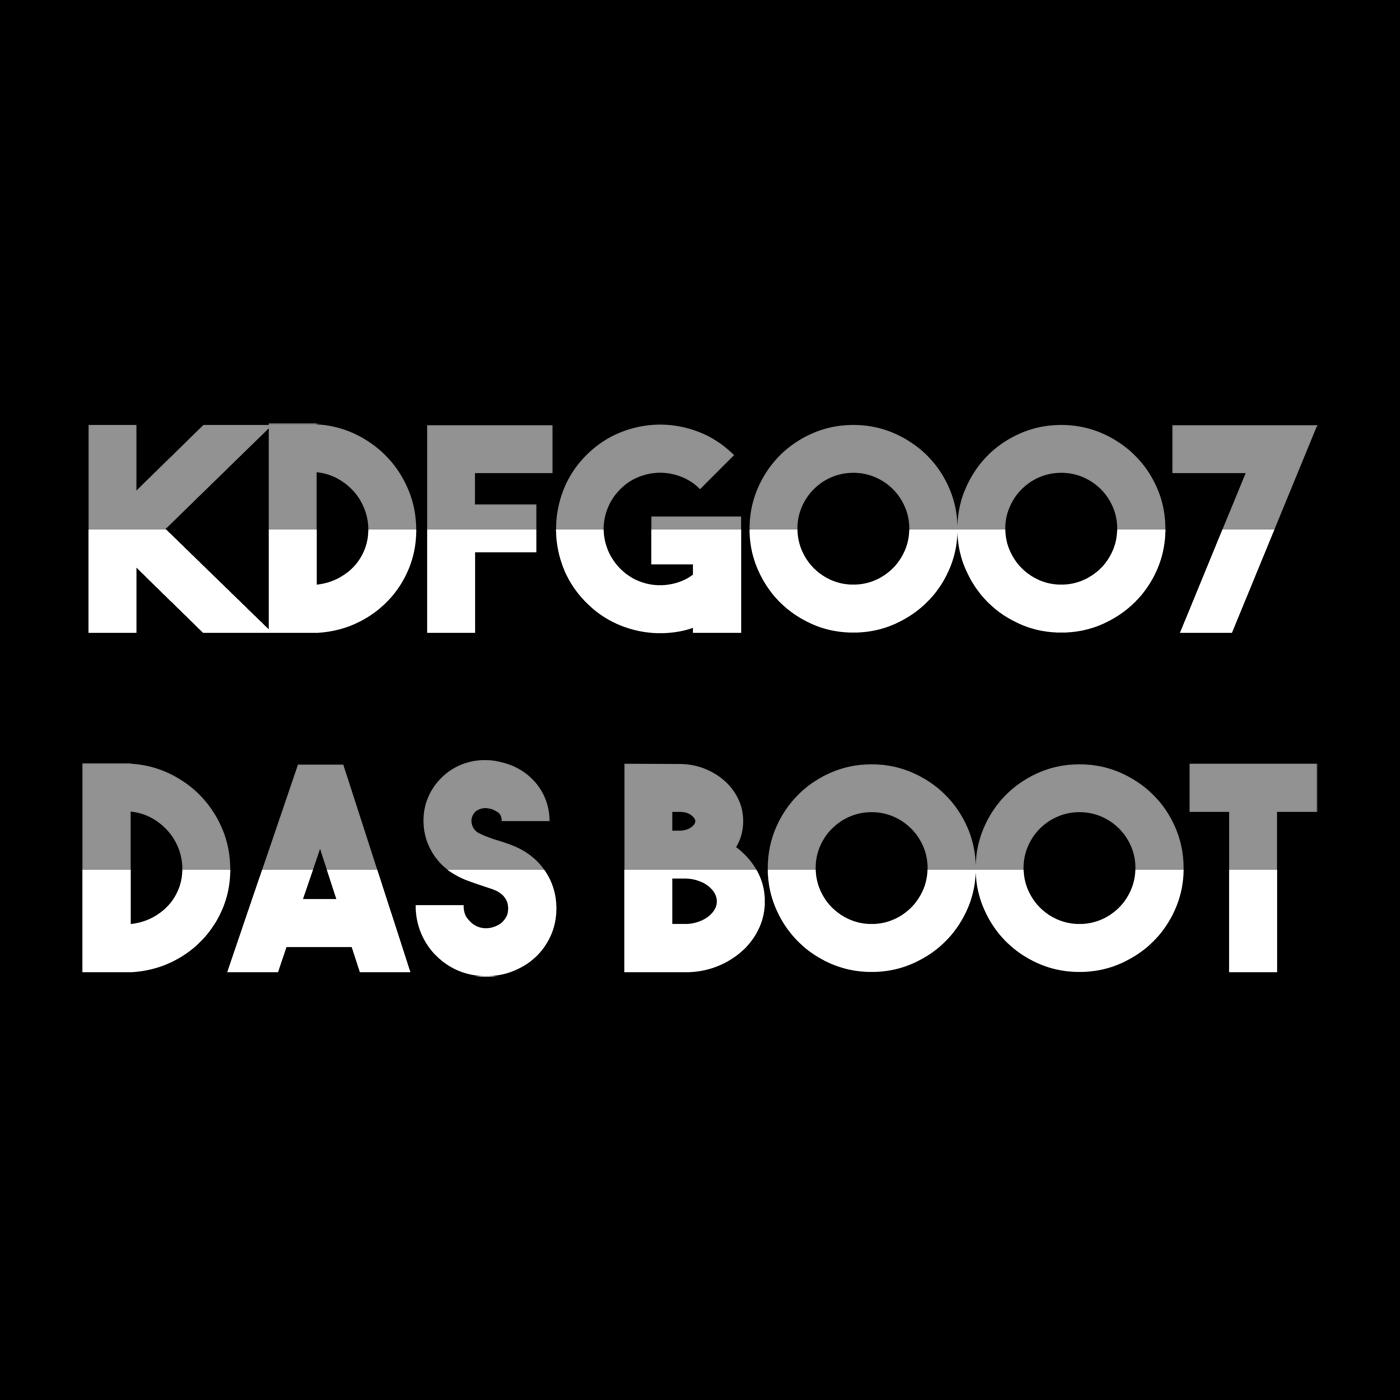 KdFg007 Das Boot